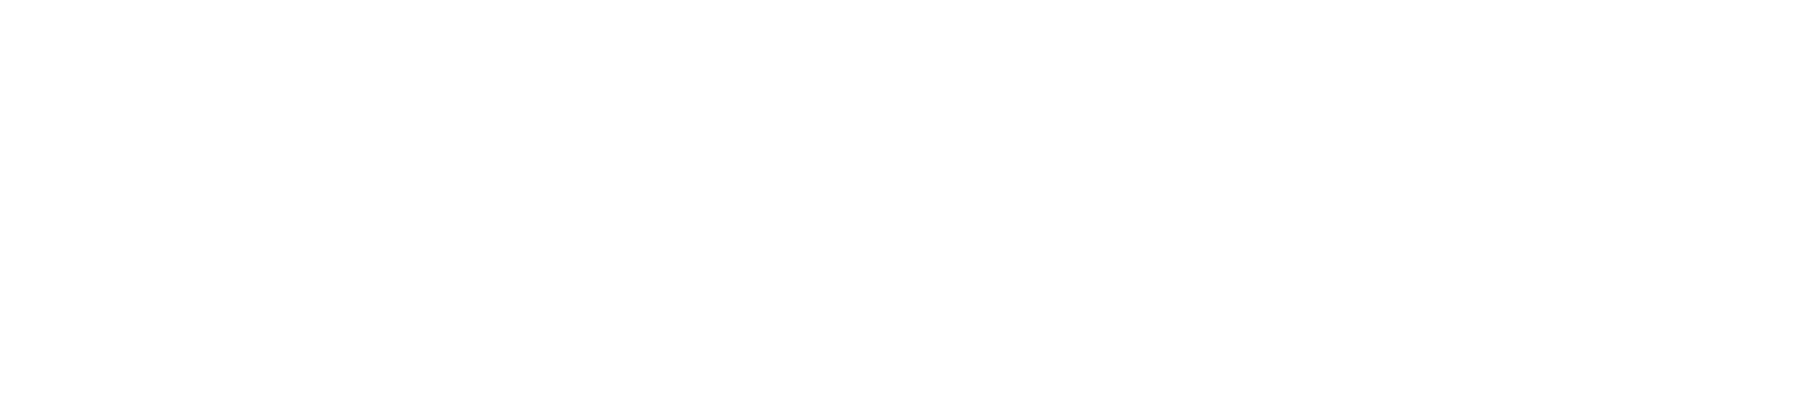 Huckberg GmbH